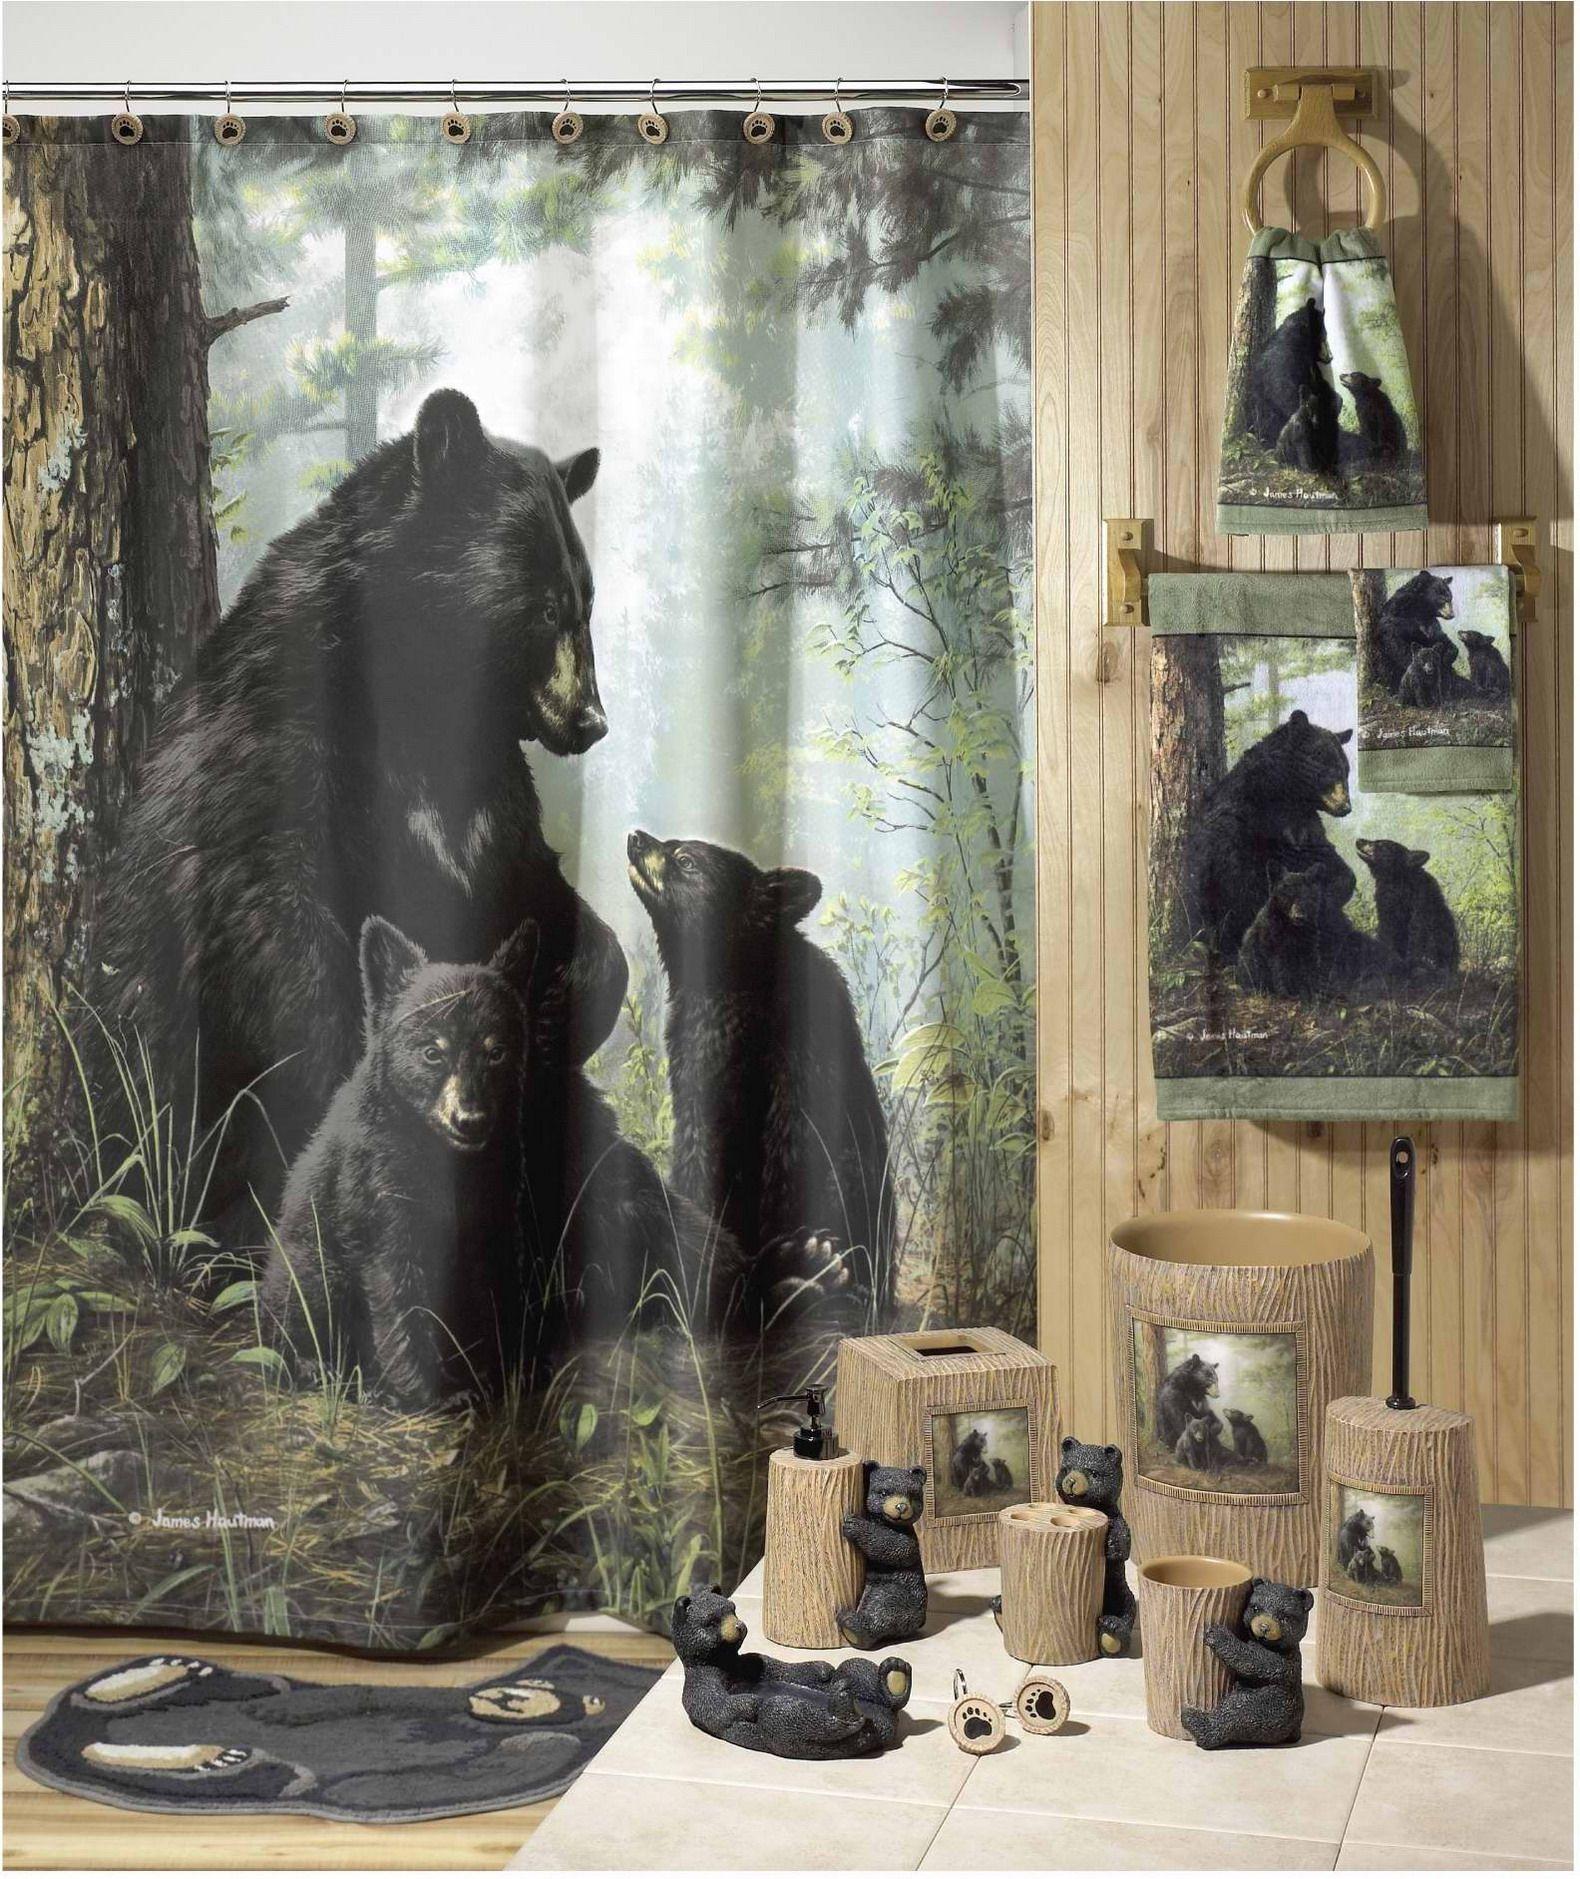 Bear Curtains In Bathroom   Bing Images